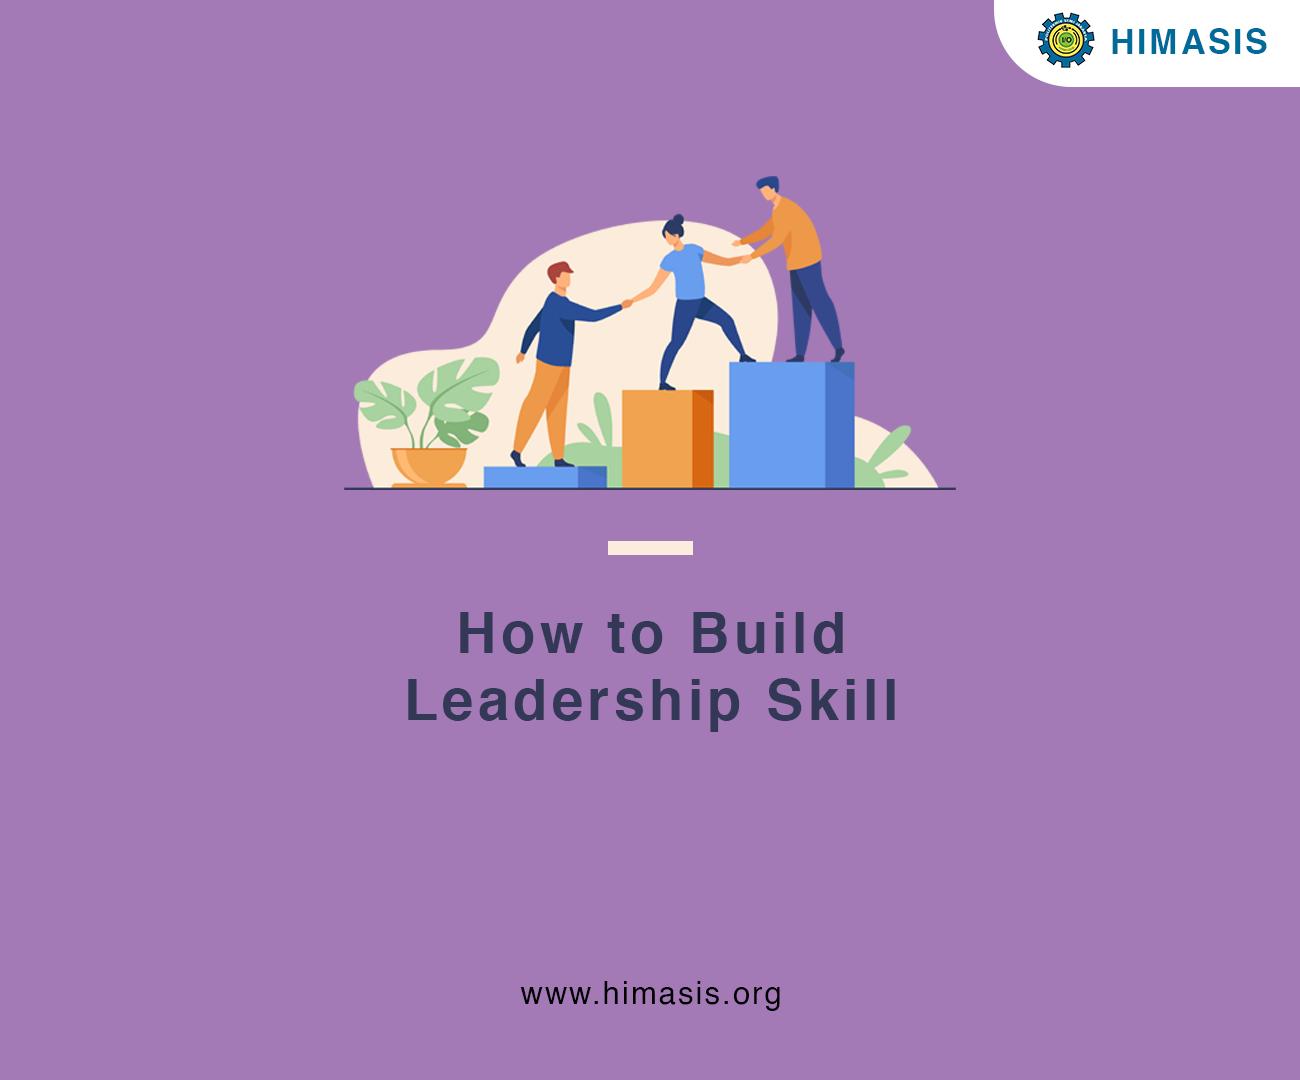 How to Build Leadership Skill